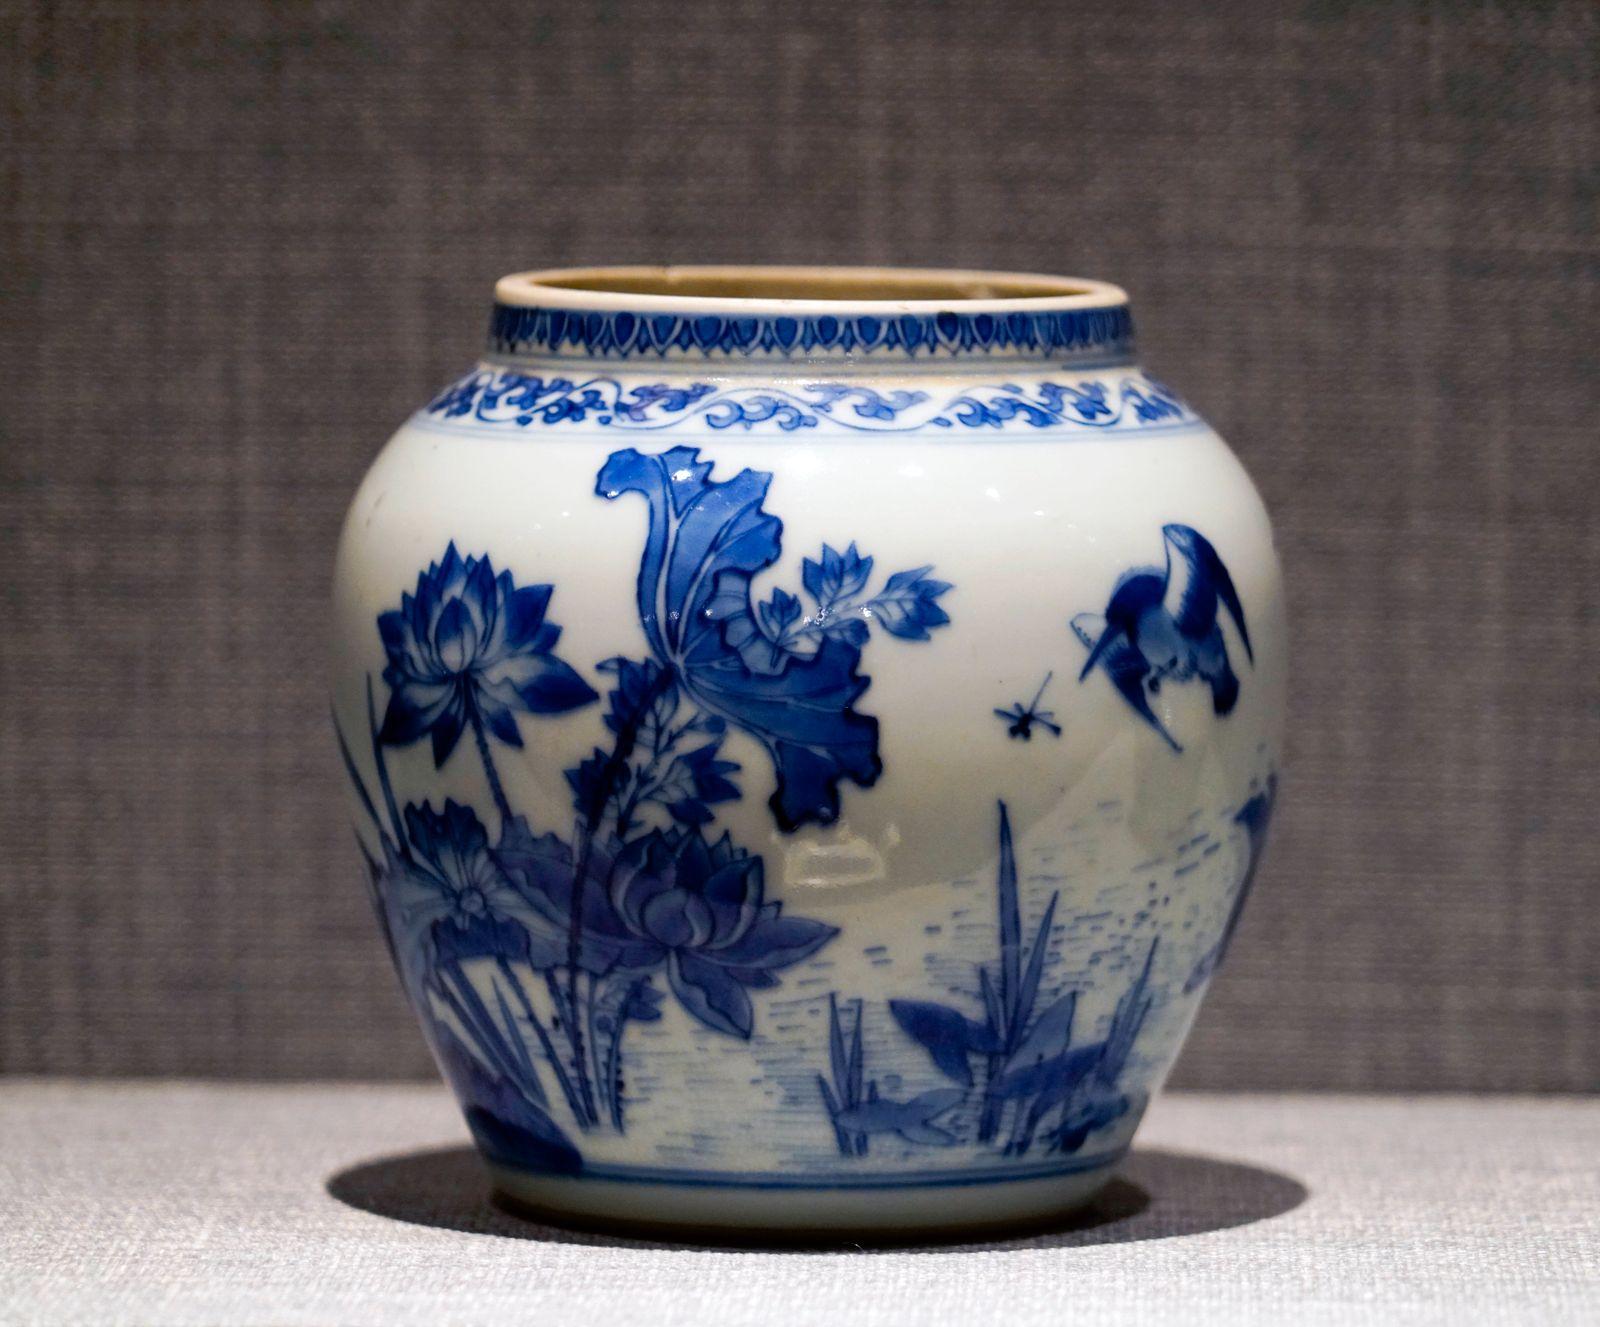 Ming Dynasty porcelain PUBLICATIONxNOTxINxCHN 648755772197961736